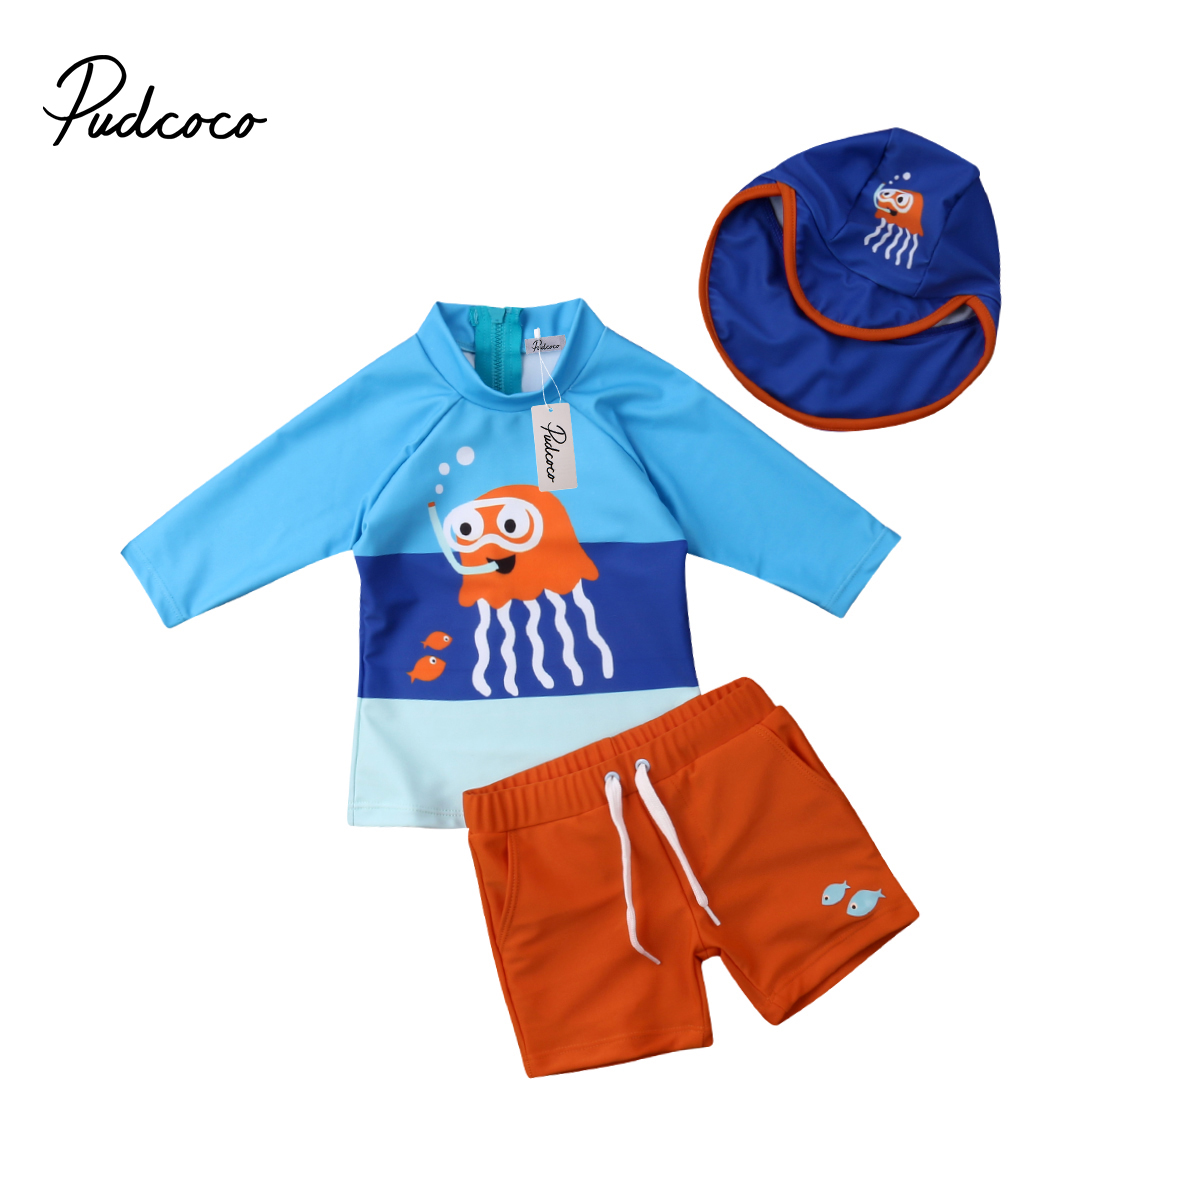 USA Toddler Kid Baby Boys Bikini Swimwear Swimsuit Bathing Surfing Suit UV 50+